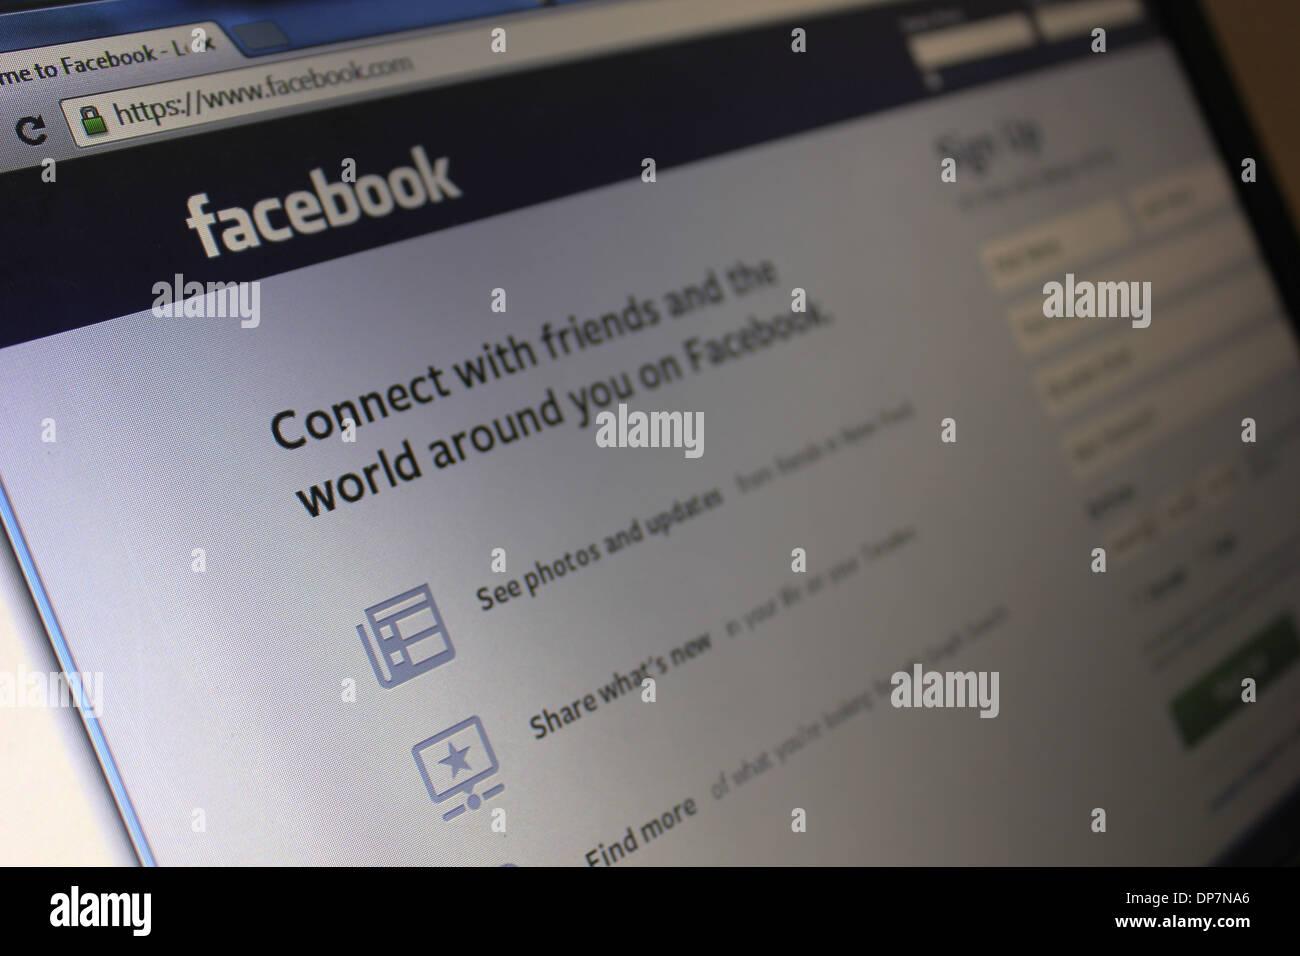 Facebook login www c How to